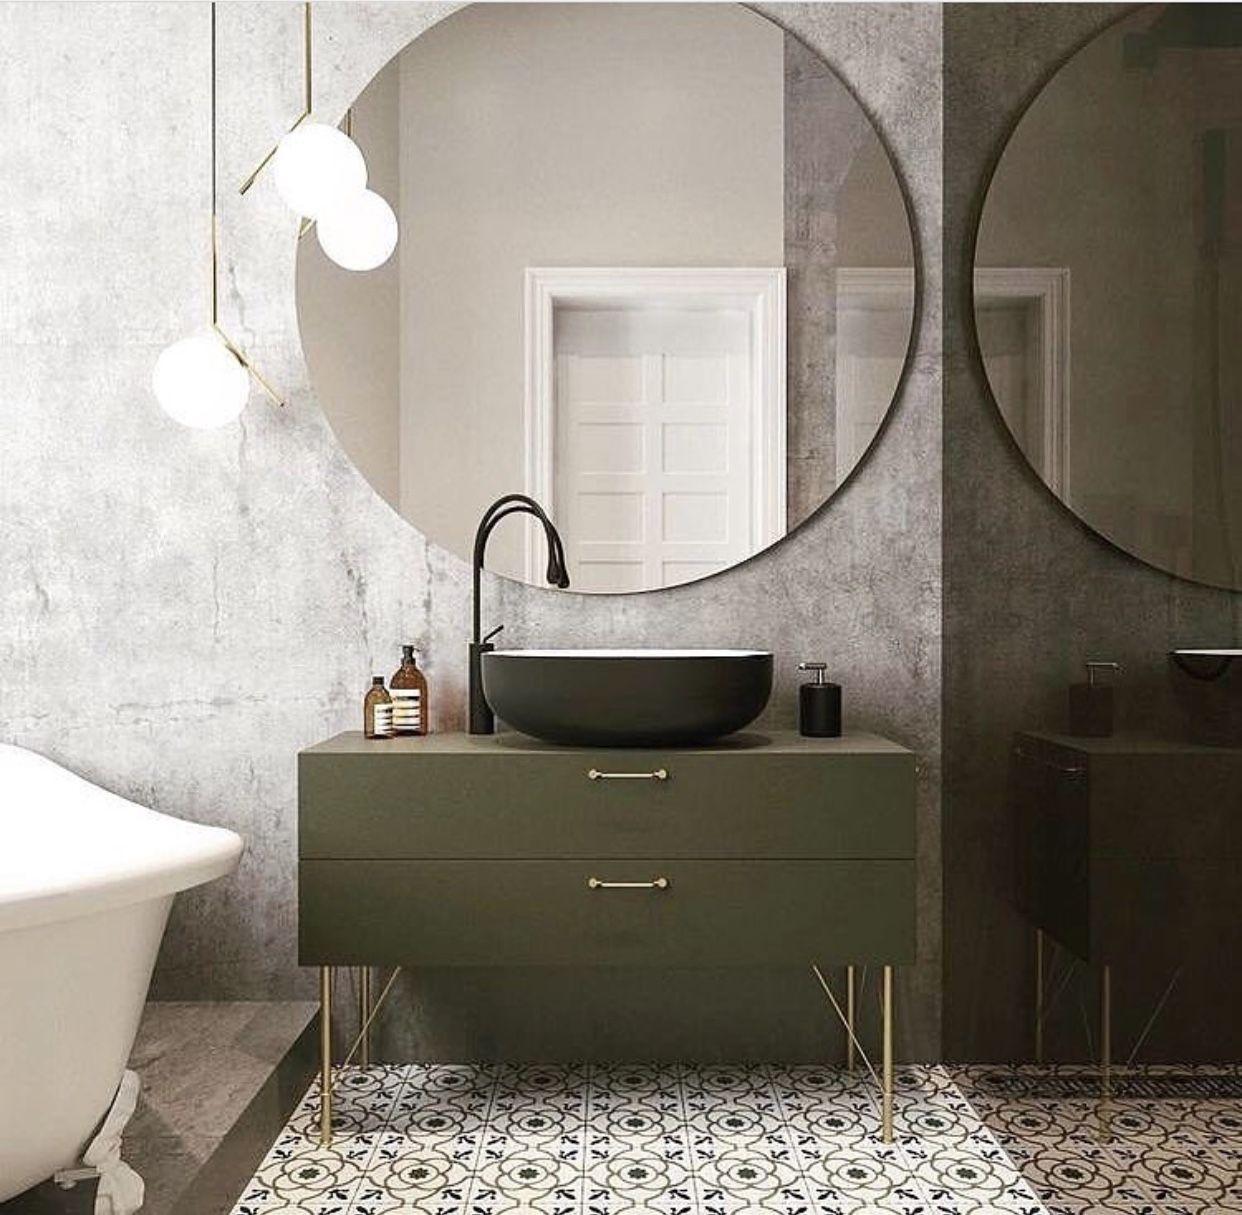 Couleur Meuble Et Vasque Miroir Rond Xxl Idee Salle De Bain Decoration Salle De Bain Salle De Bains Kaki